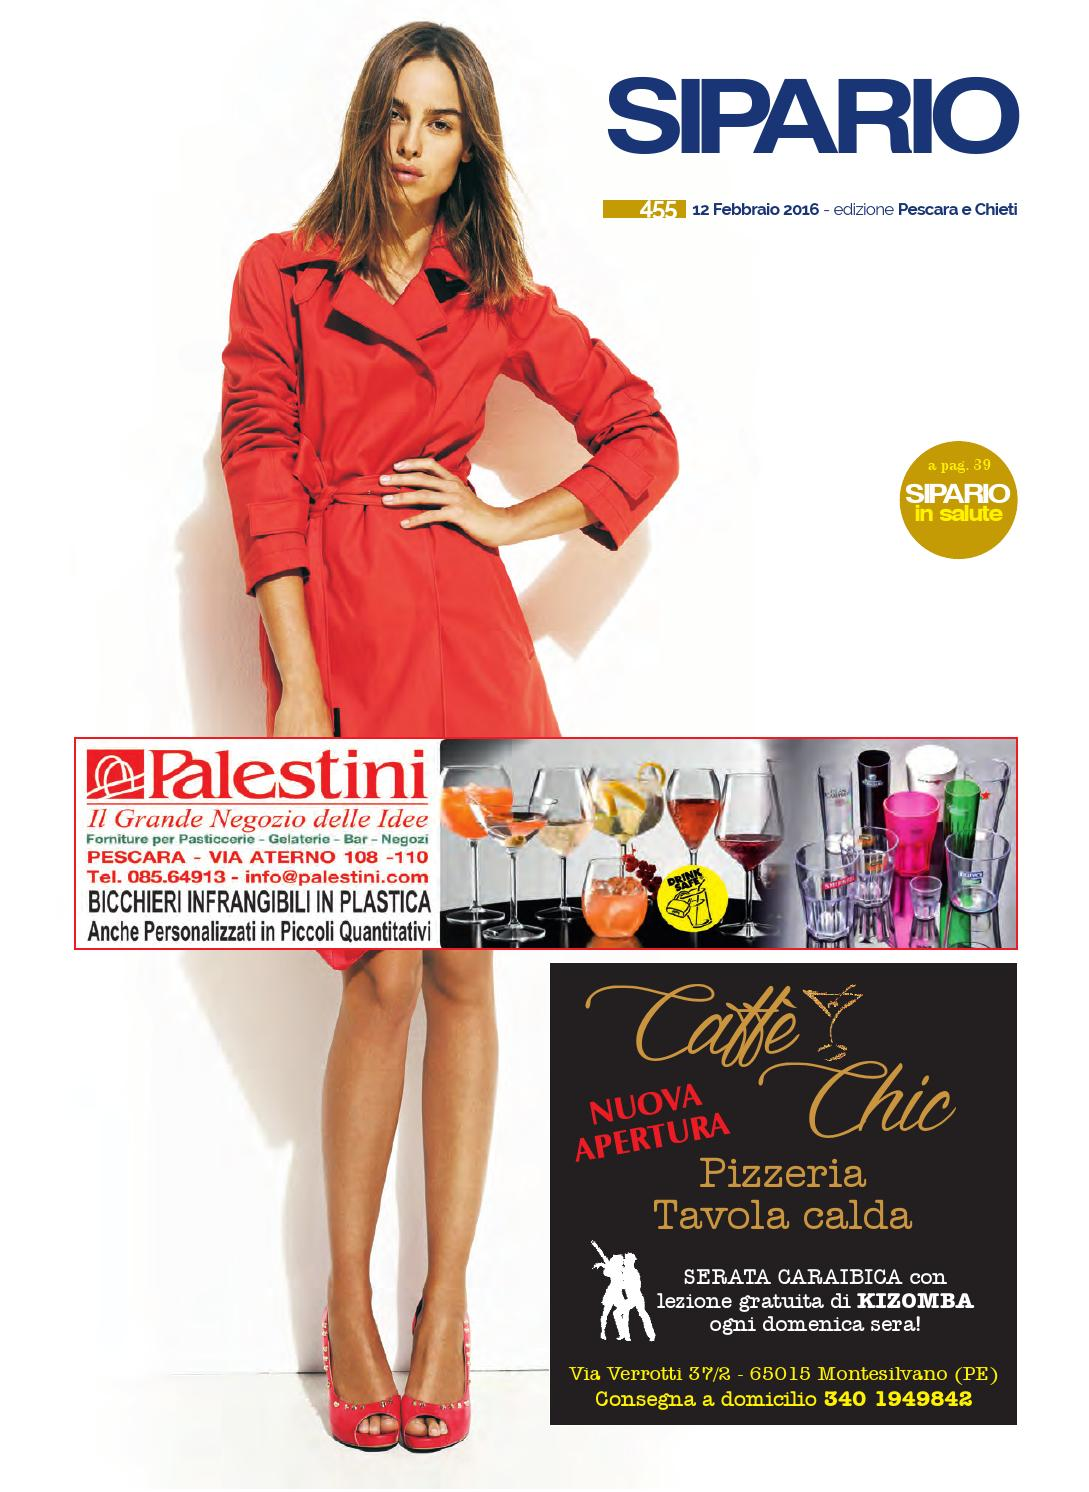 Sipario Pescara Chieti febbraio 2016 by Publipress srl - issuu c4b2e1b6e23